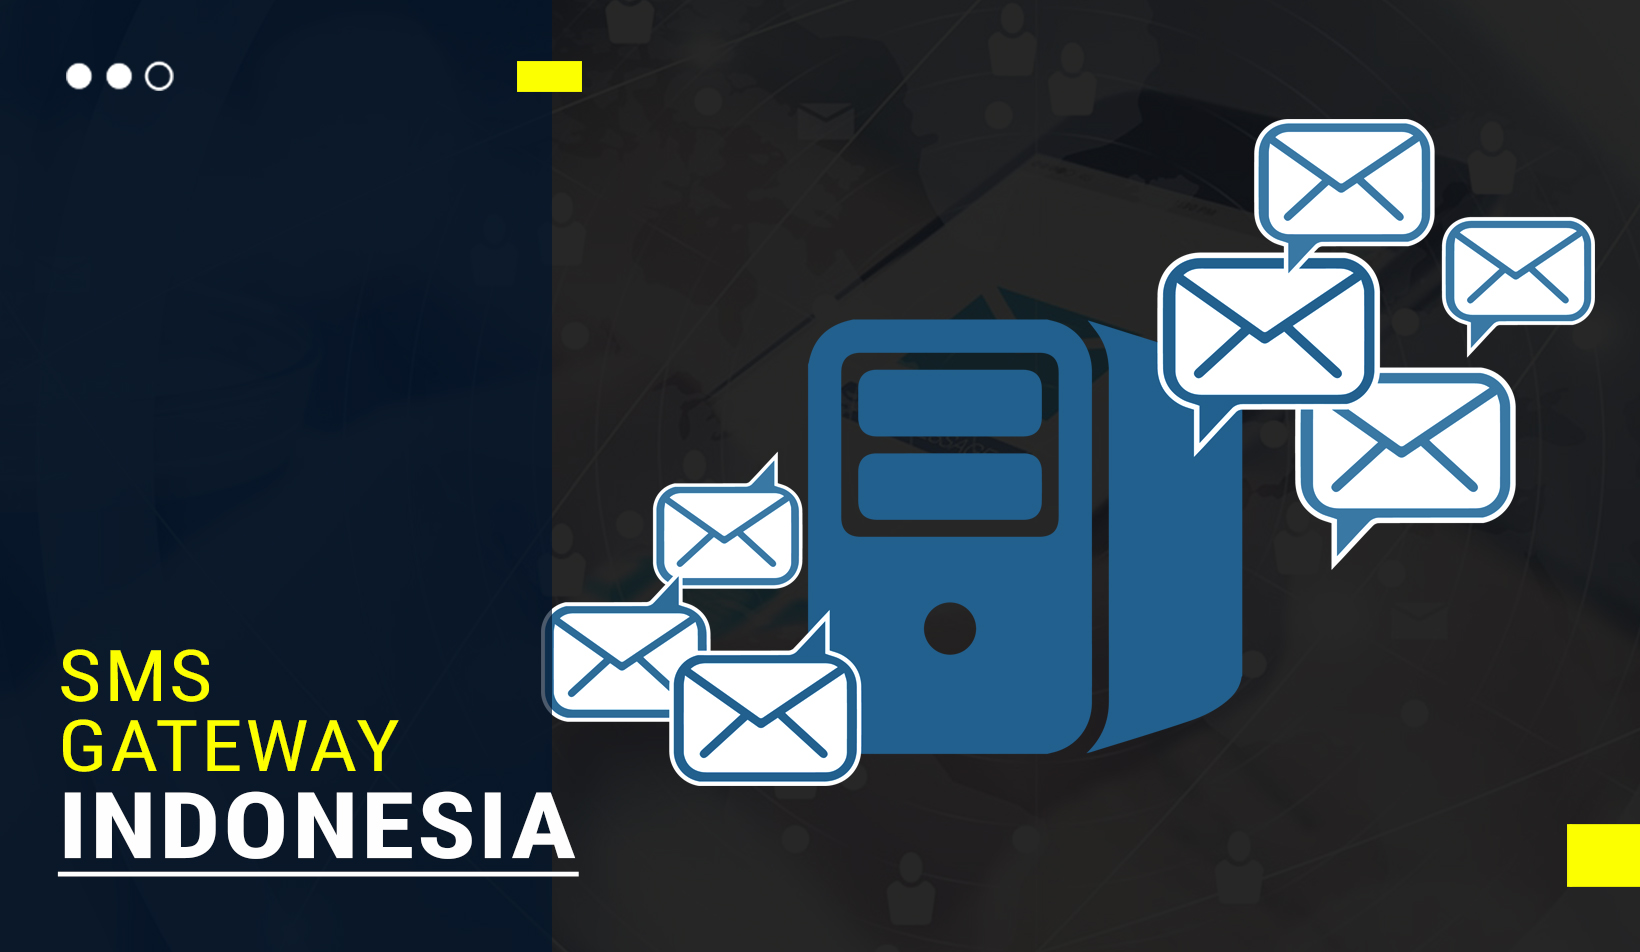 SMS Gateway Indonesia